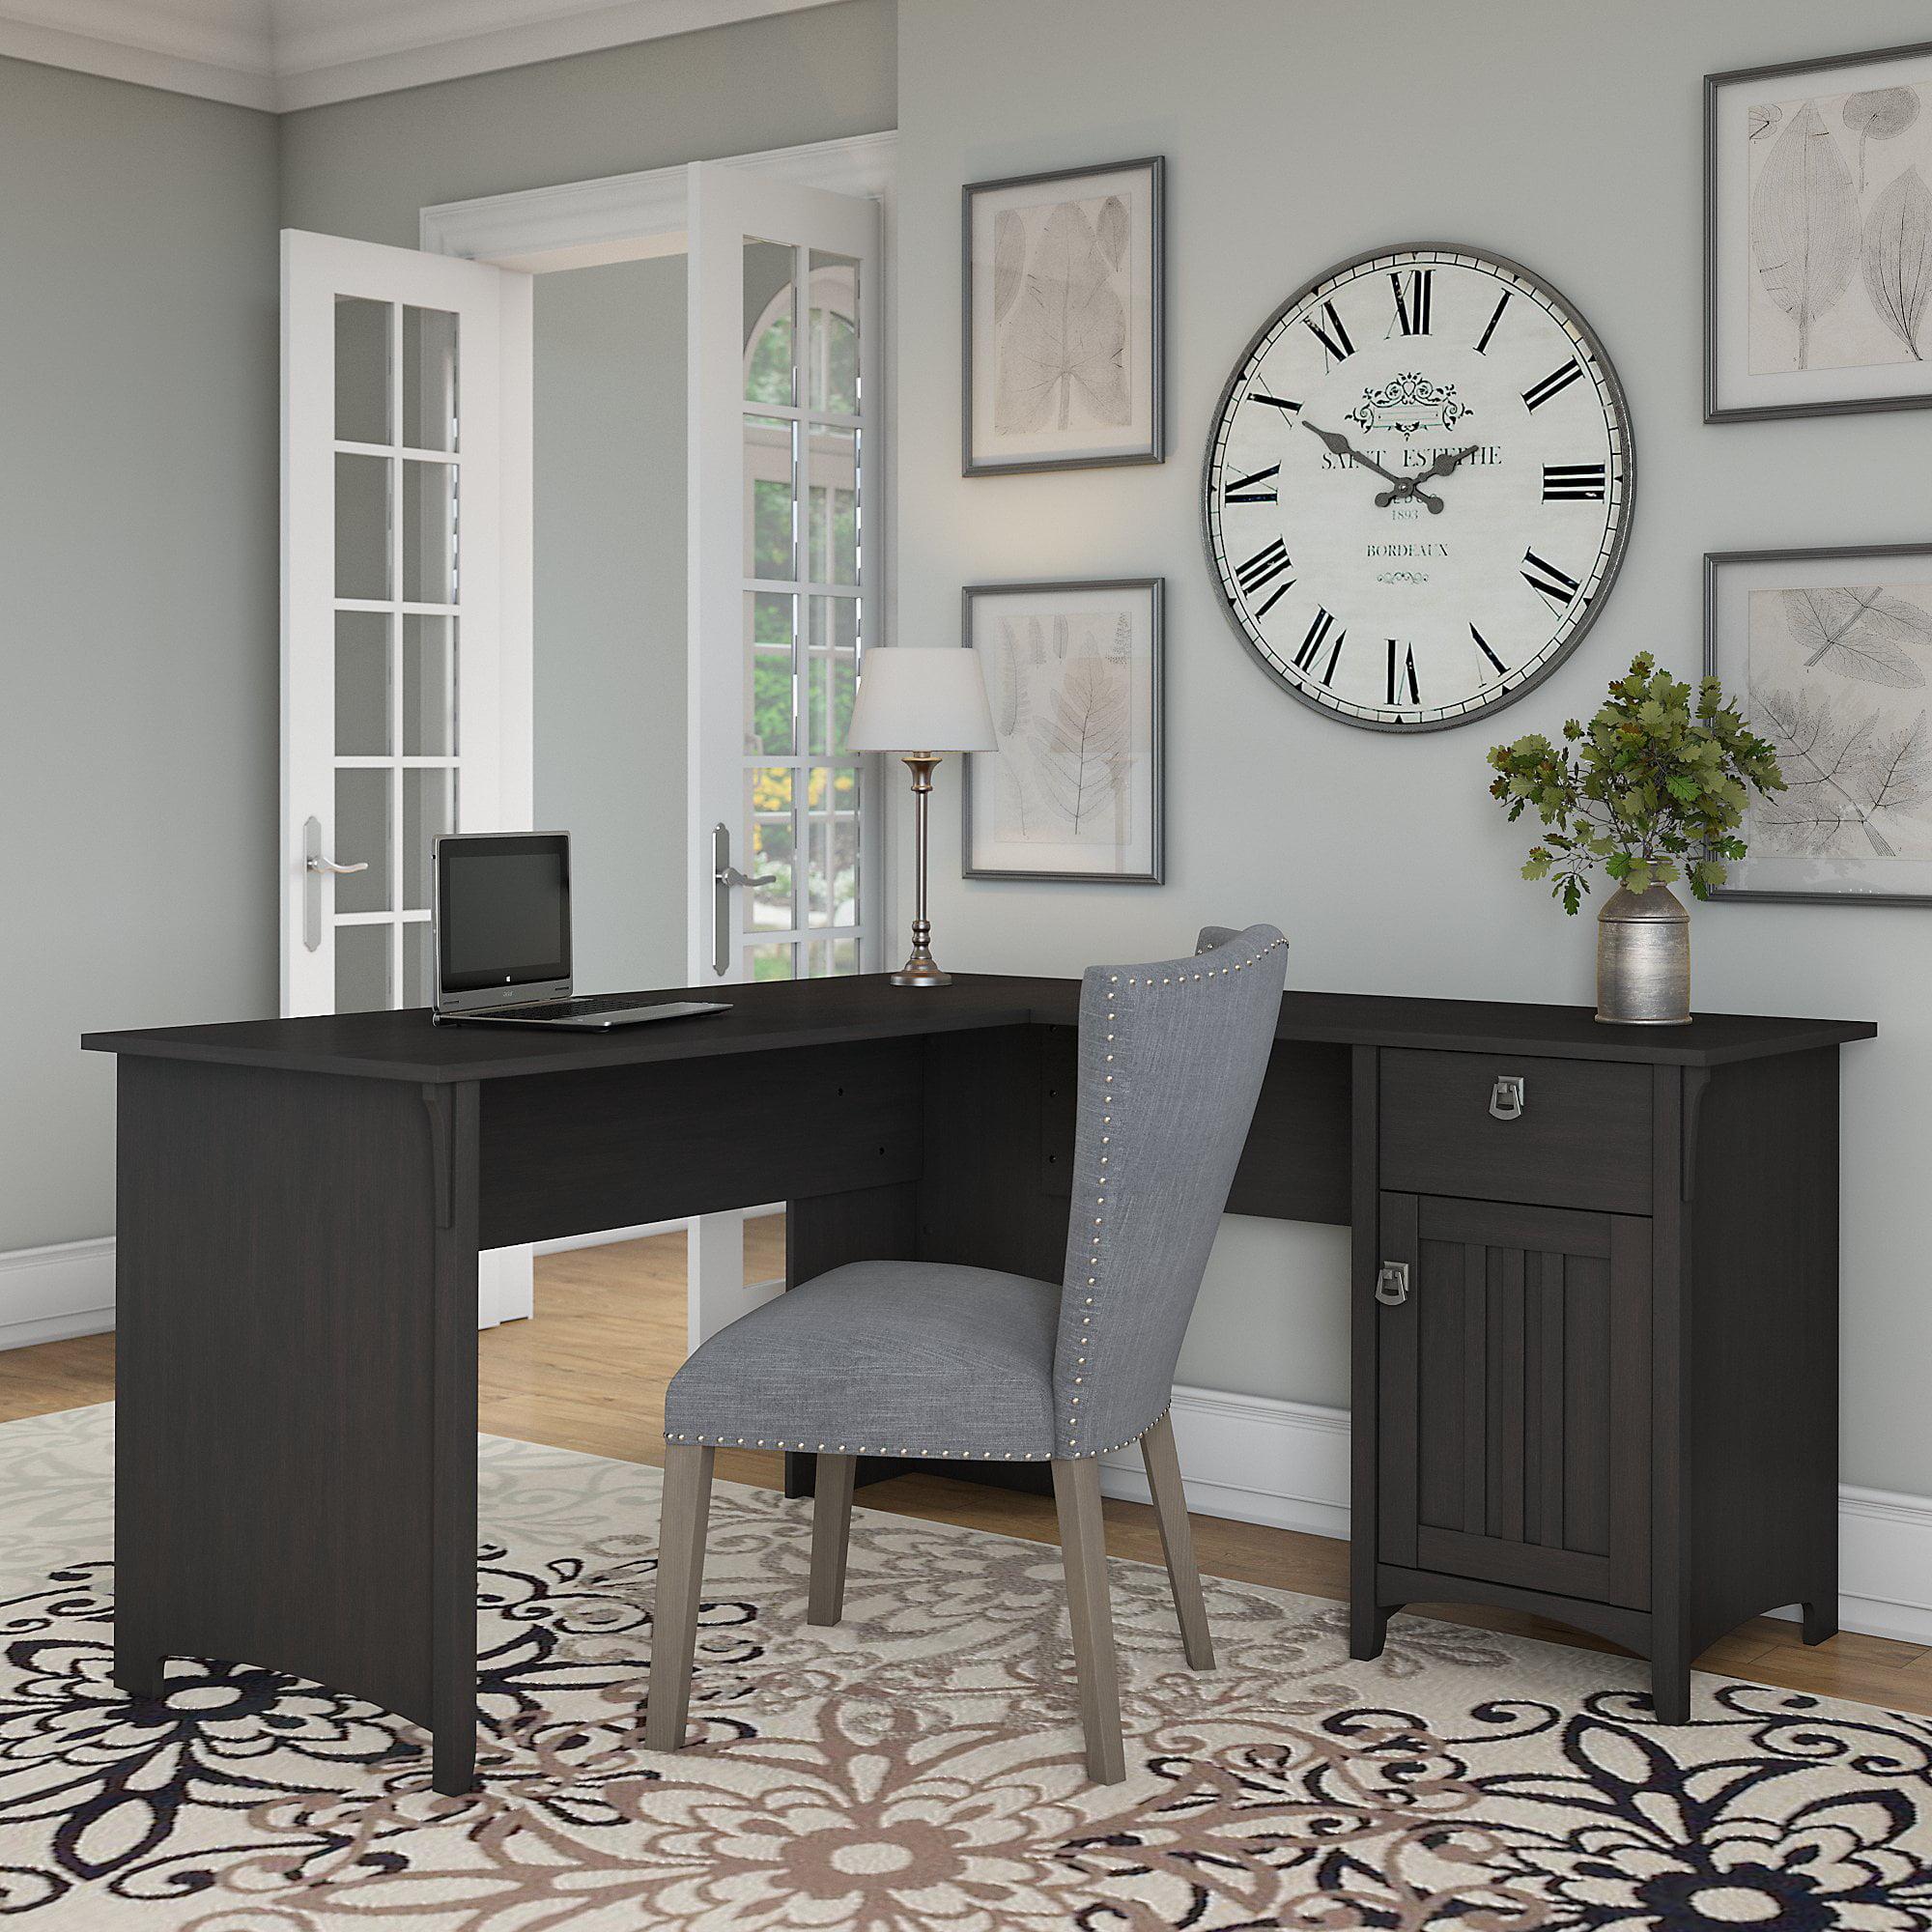 Merveilleux Bush Furniture Salinas L Shaped Desk With Storage In Vintage Black